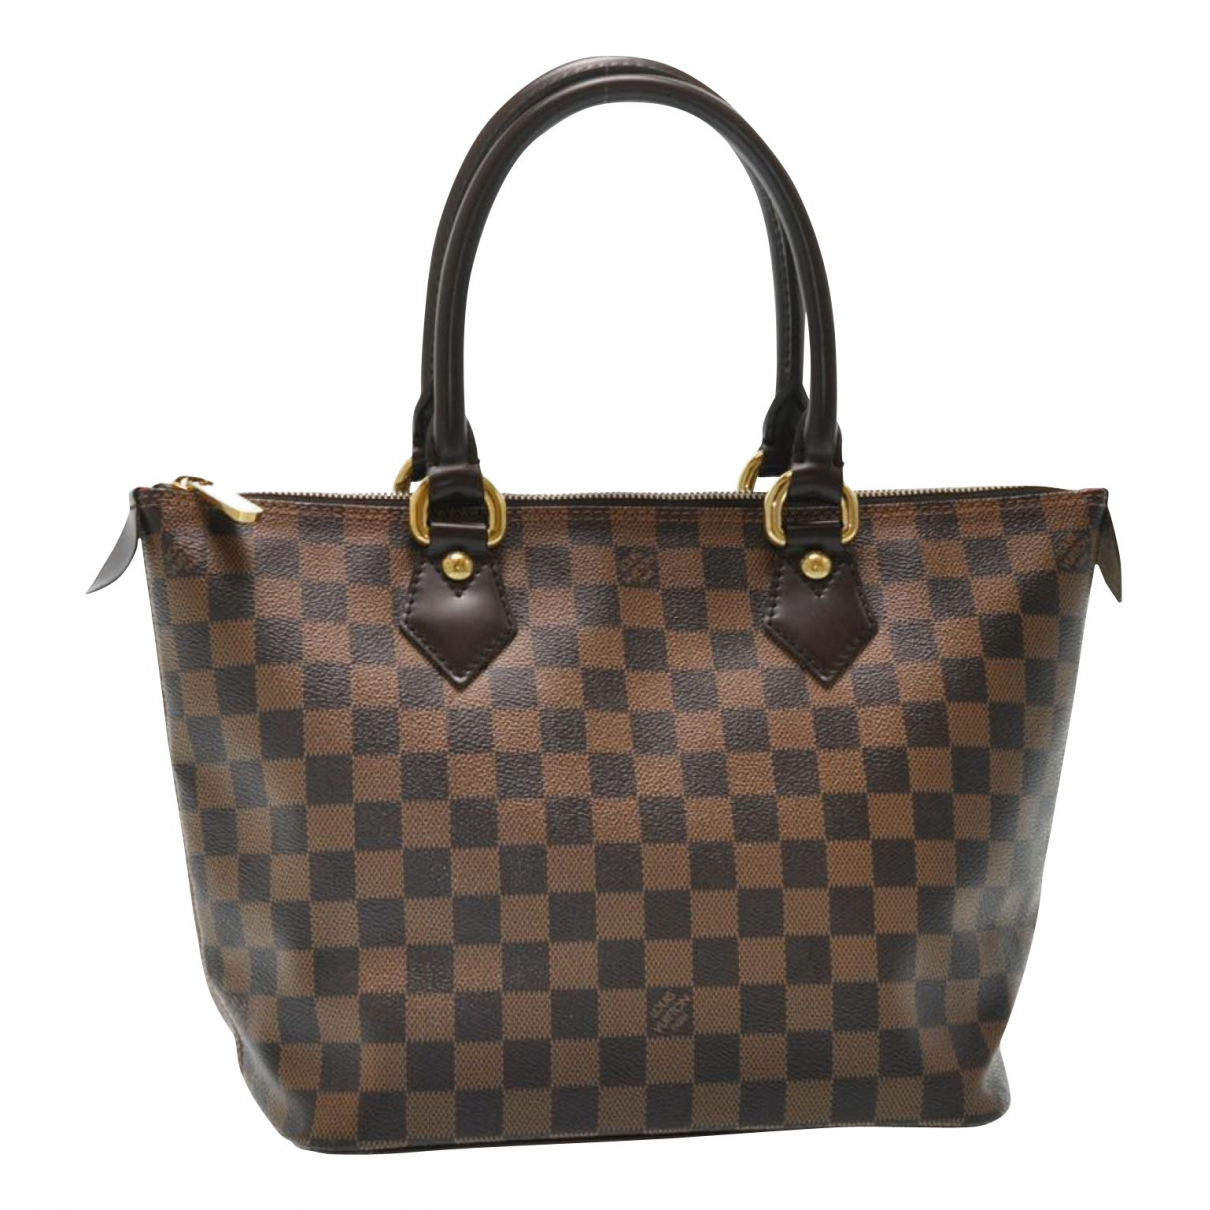 Louis Vuitton - Sac a main Saleya pour femme en toile - marron